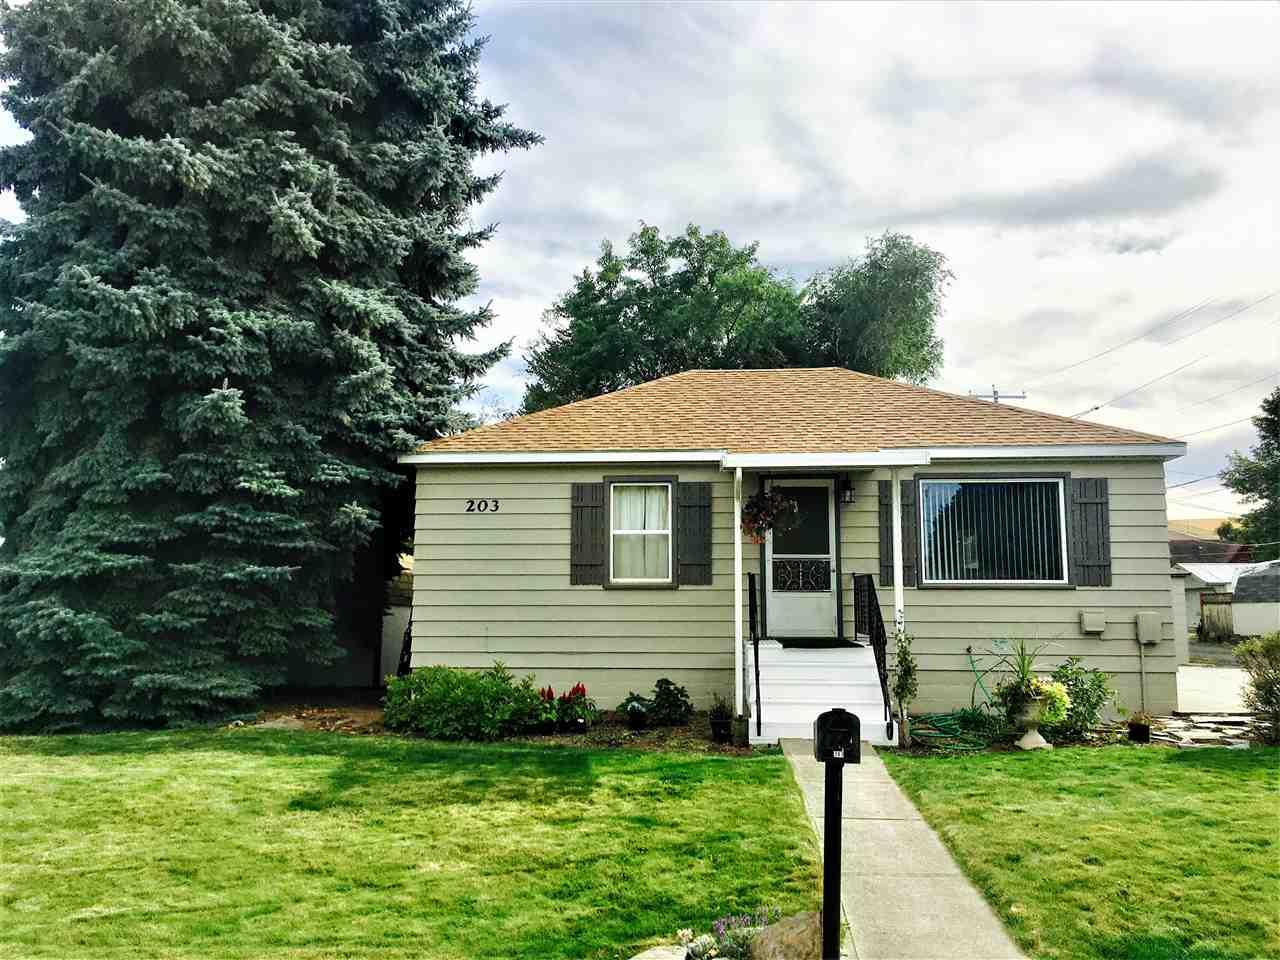 Single Family Home for Sale at 203 W Liberty Avenue 203 W Liberty Avenue St. John, Washington 97171 United States